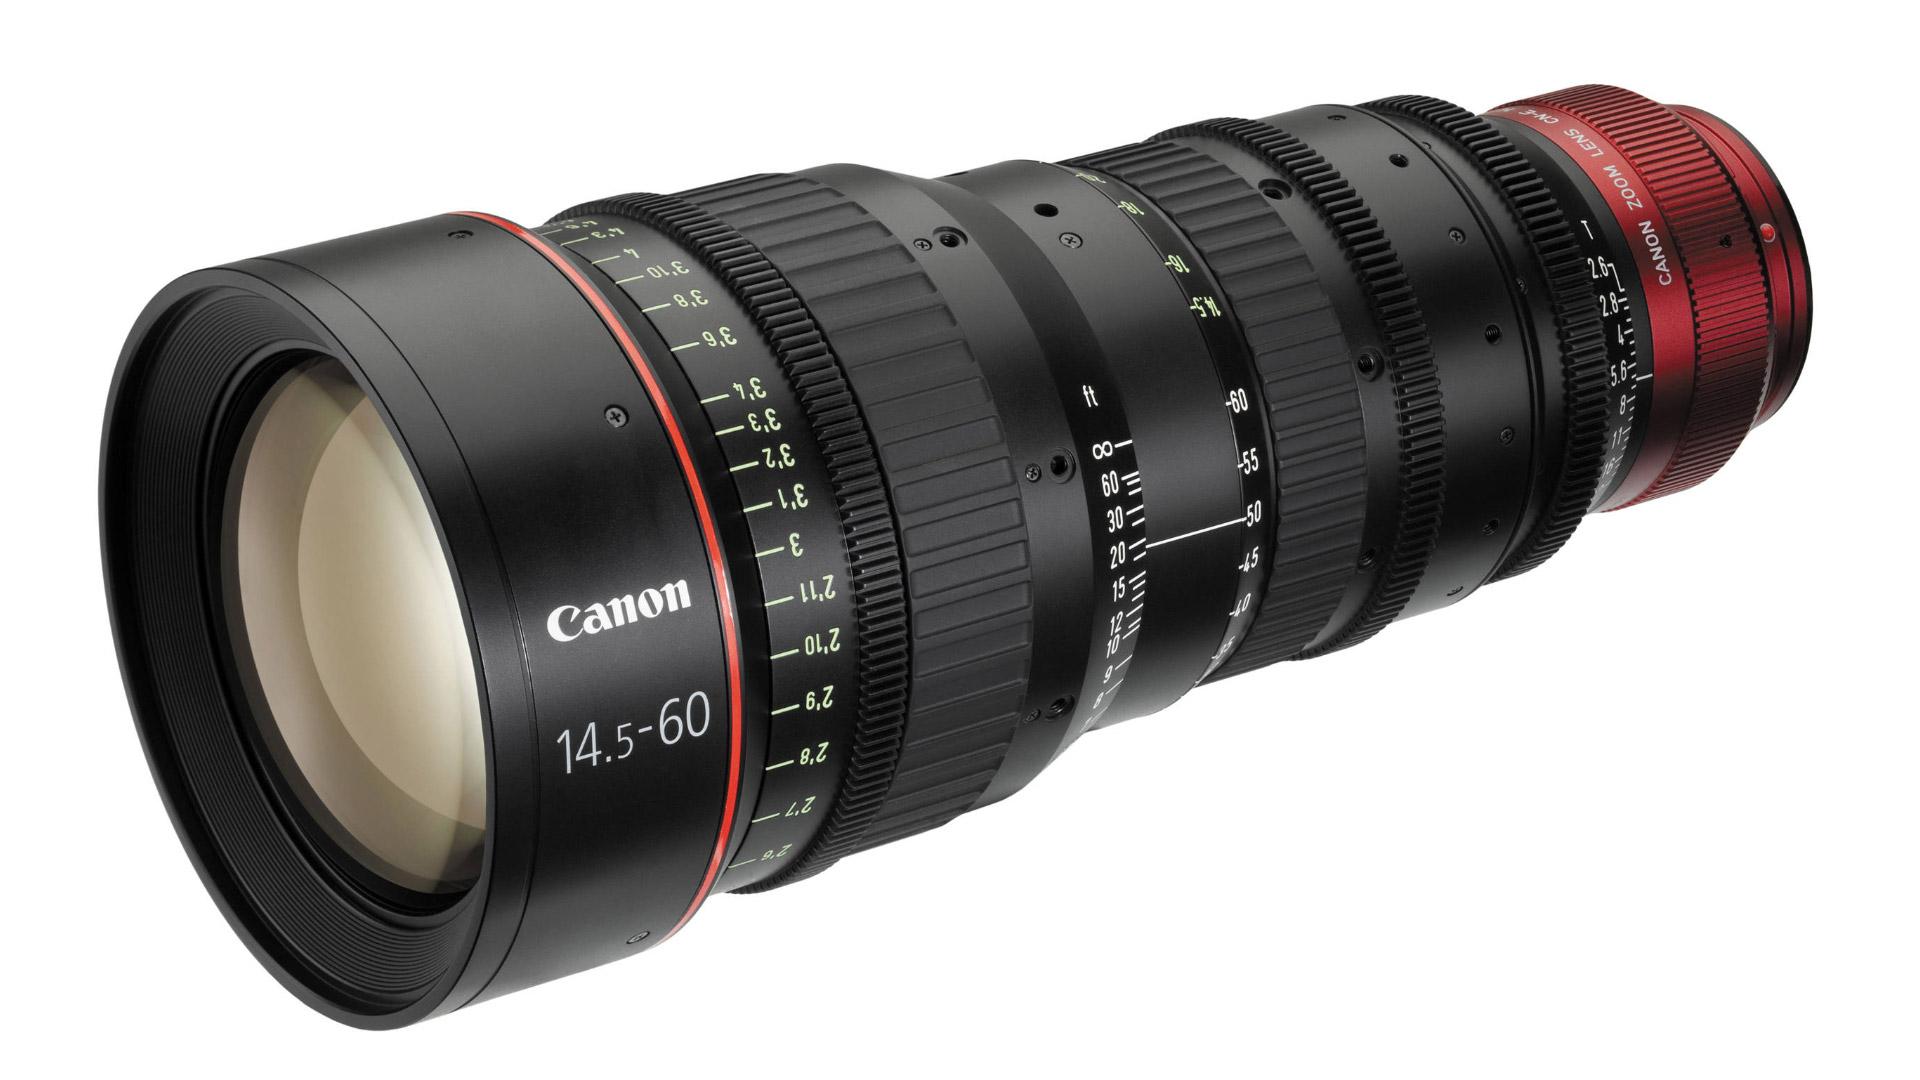 YDCFYLLLjuQ72UgcsNkwMX - Optical zoom vs digital zoom: understand your camera phone's close-up potential